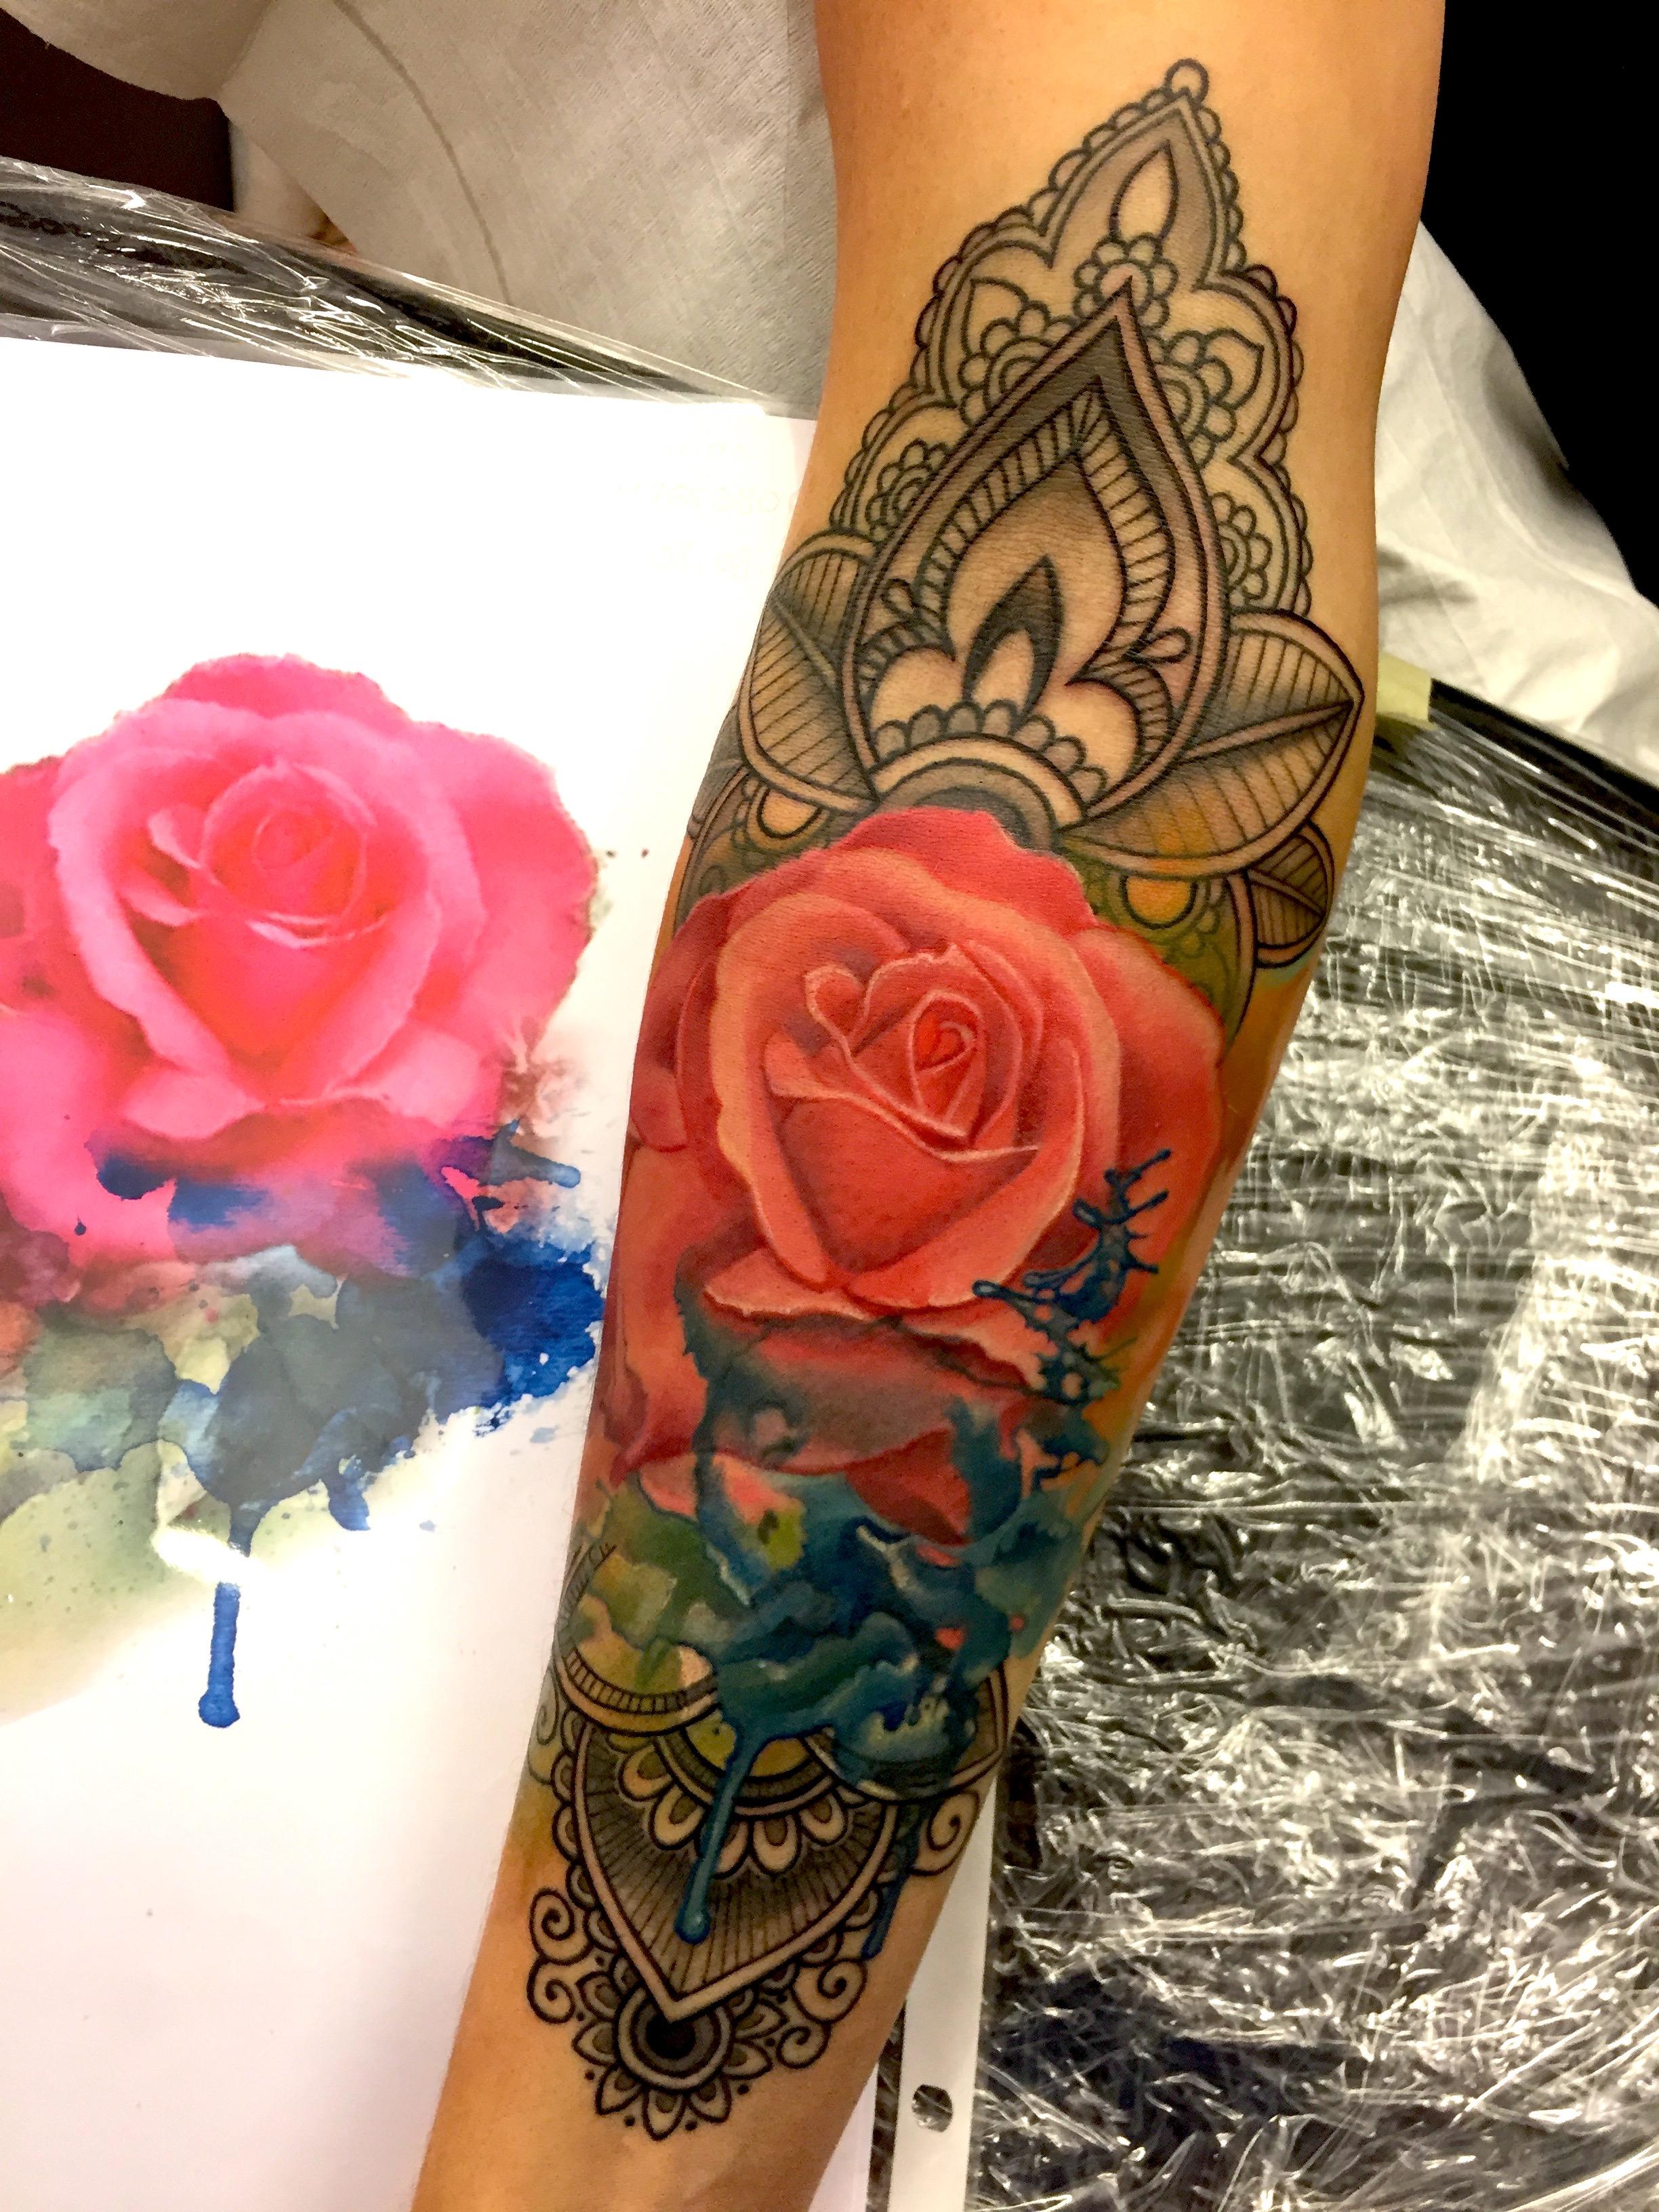 mandala, henna, electrographic tattoo, germany, bayern, rosenheim, münchen , salzburg , innsbruck, vogel, rose, tattoo, tattoo art, color, realistic